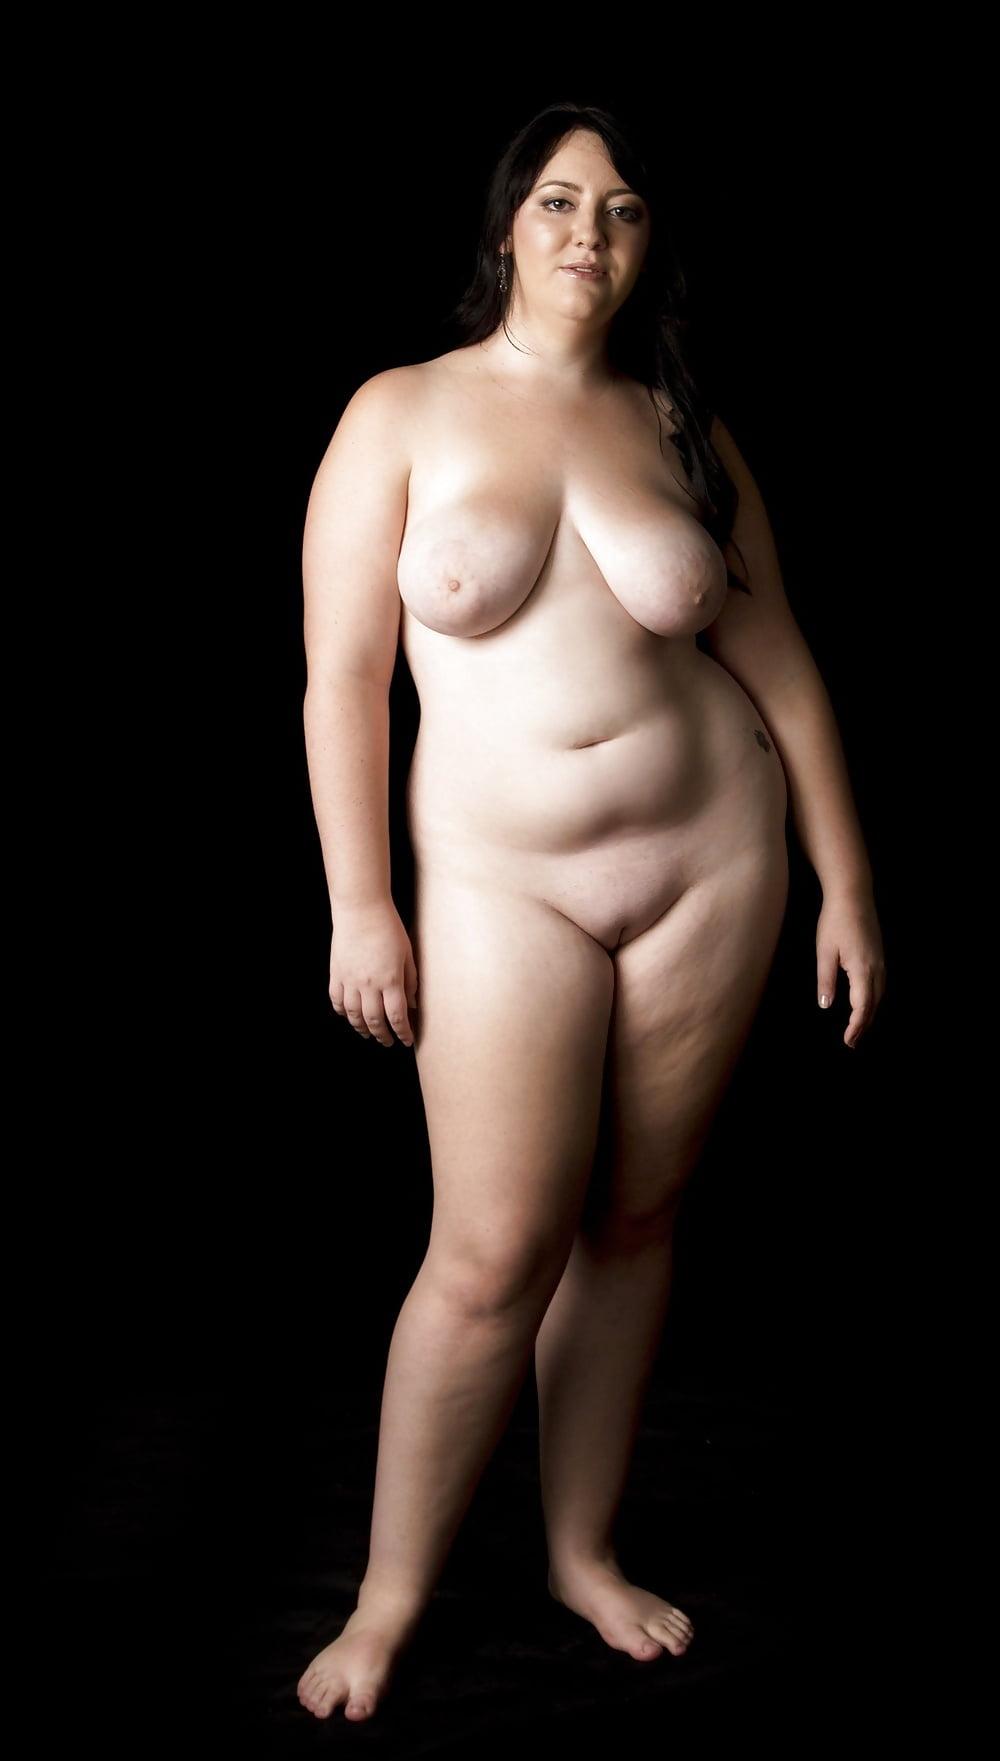 Beautiful chubby girl posing nude, boney pussy sex gifs